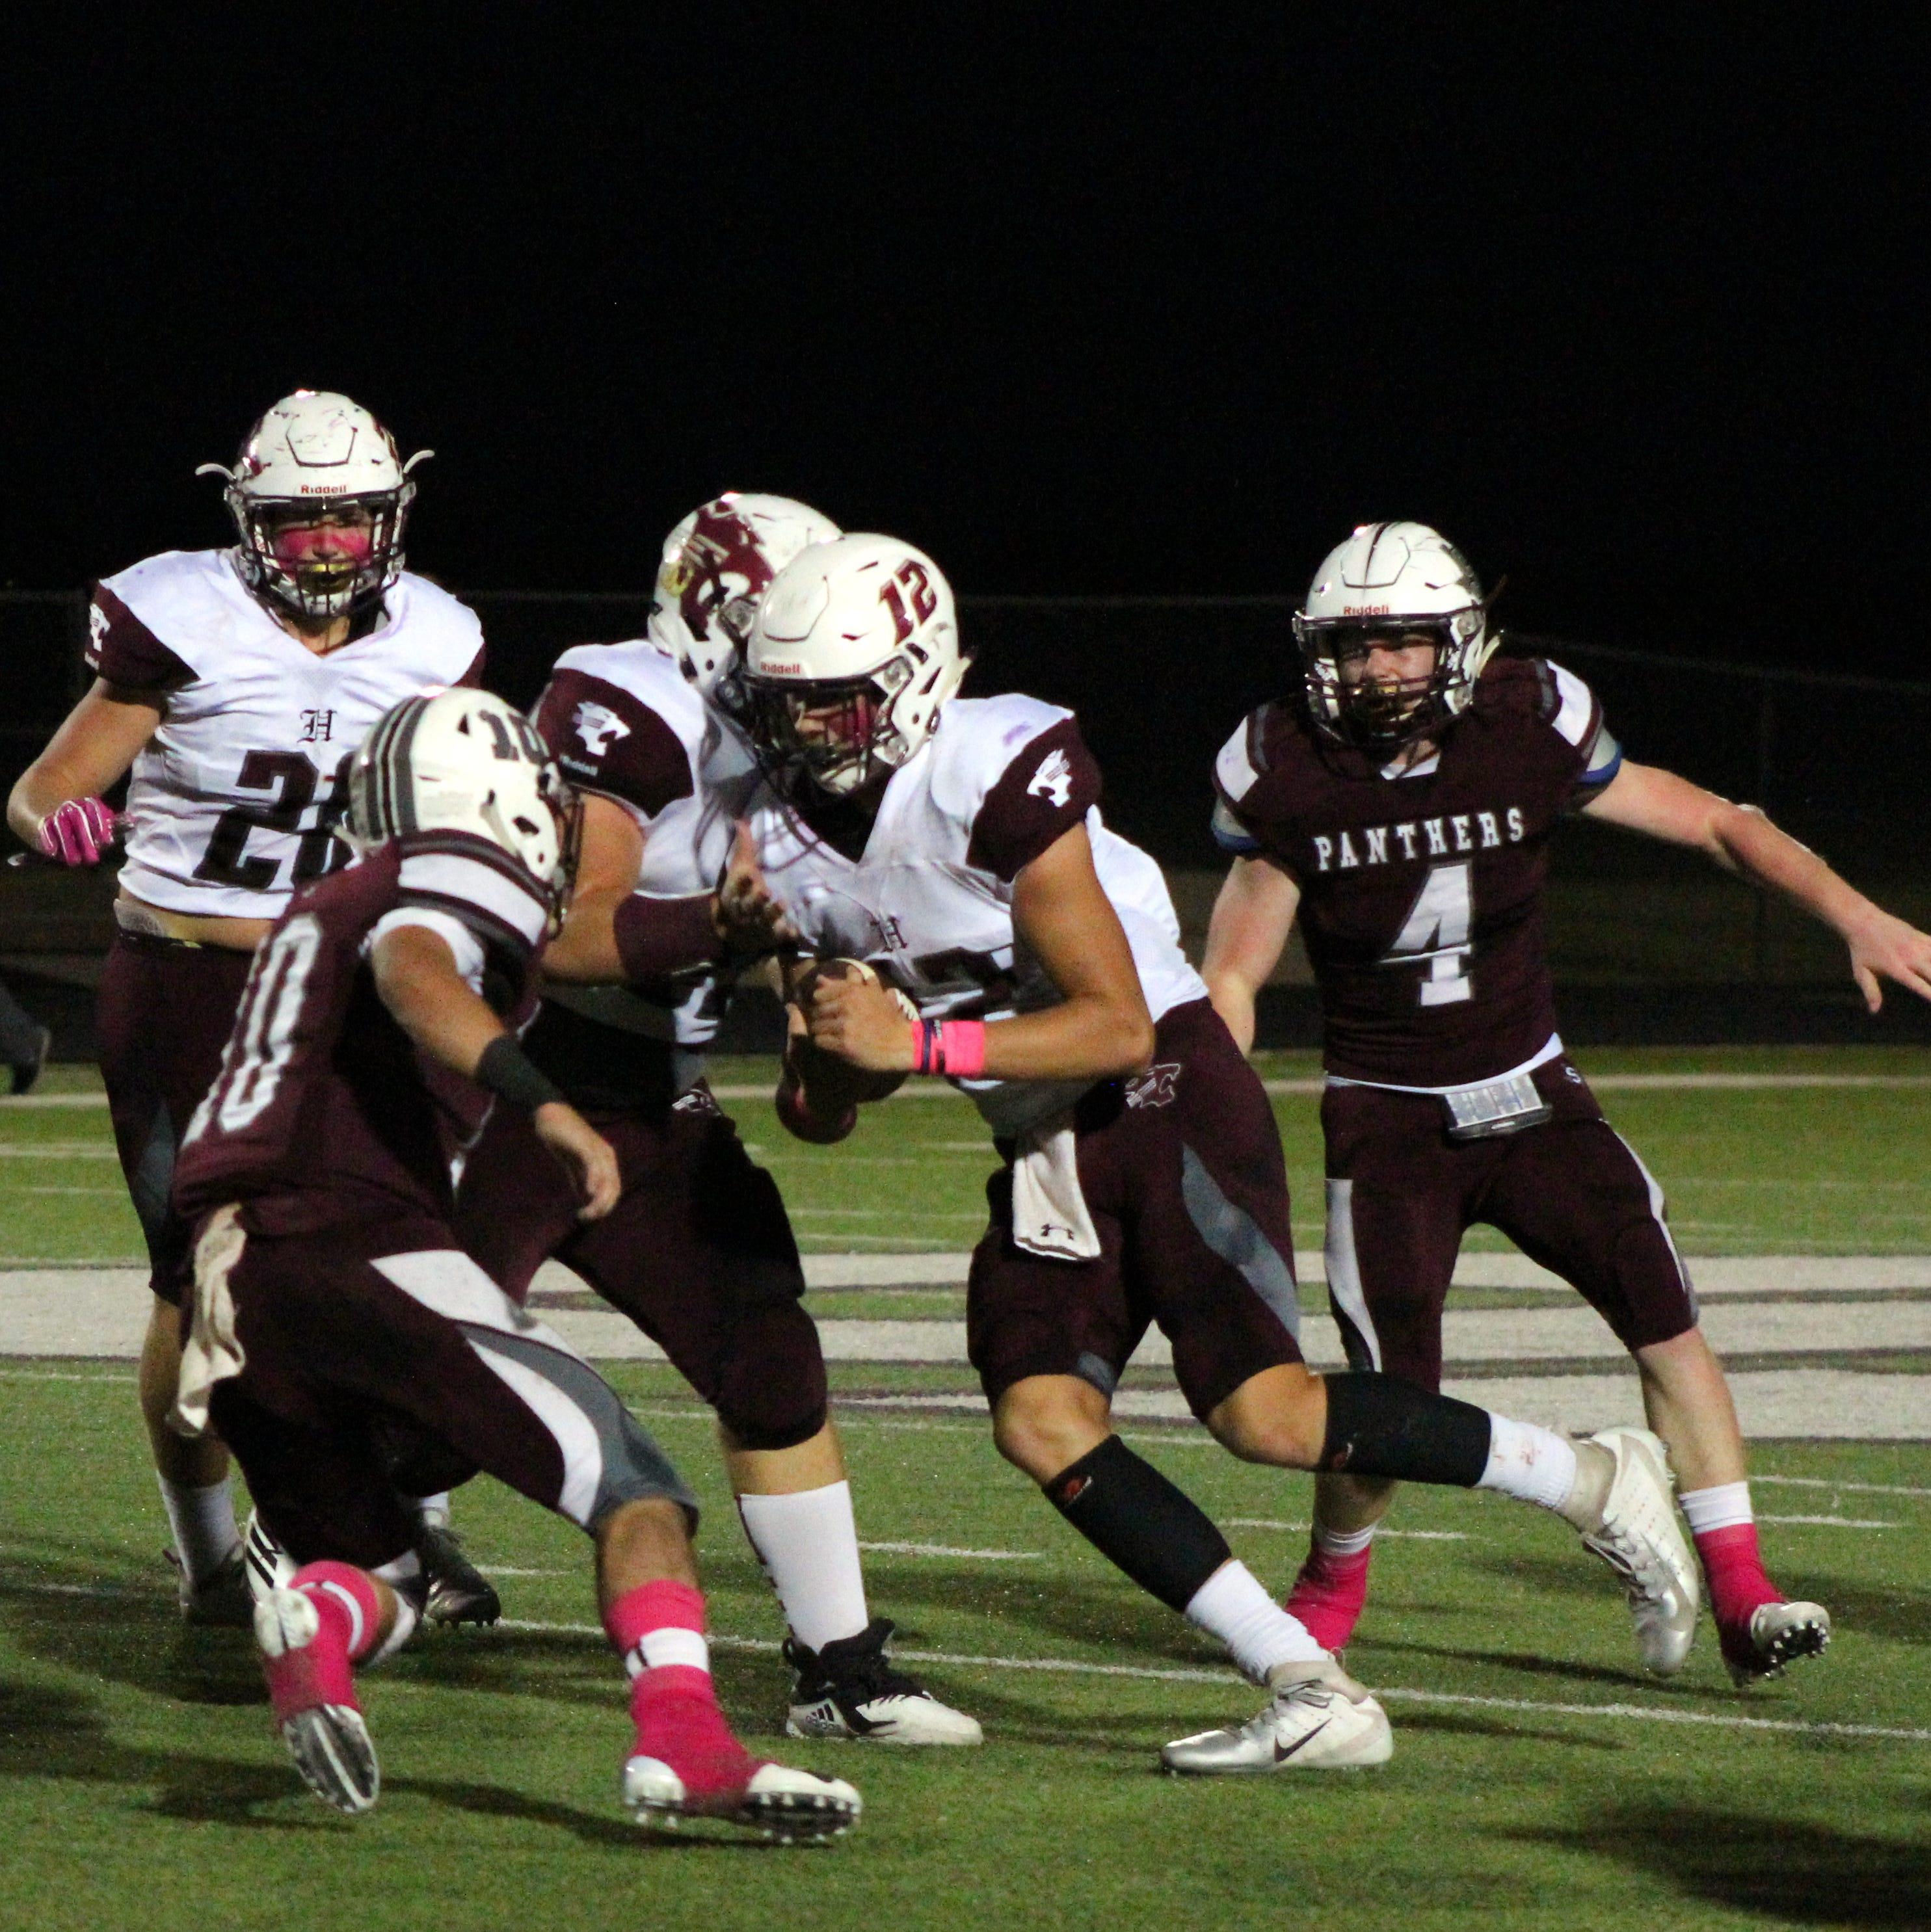 Texas High School Football Scores Oct. 4-6